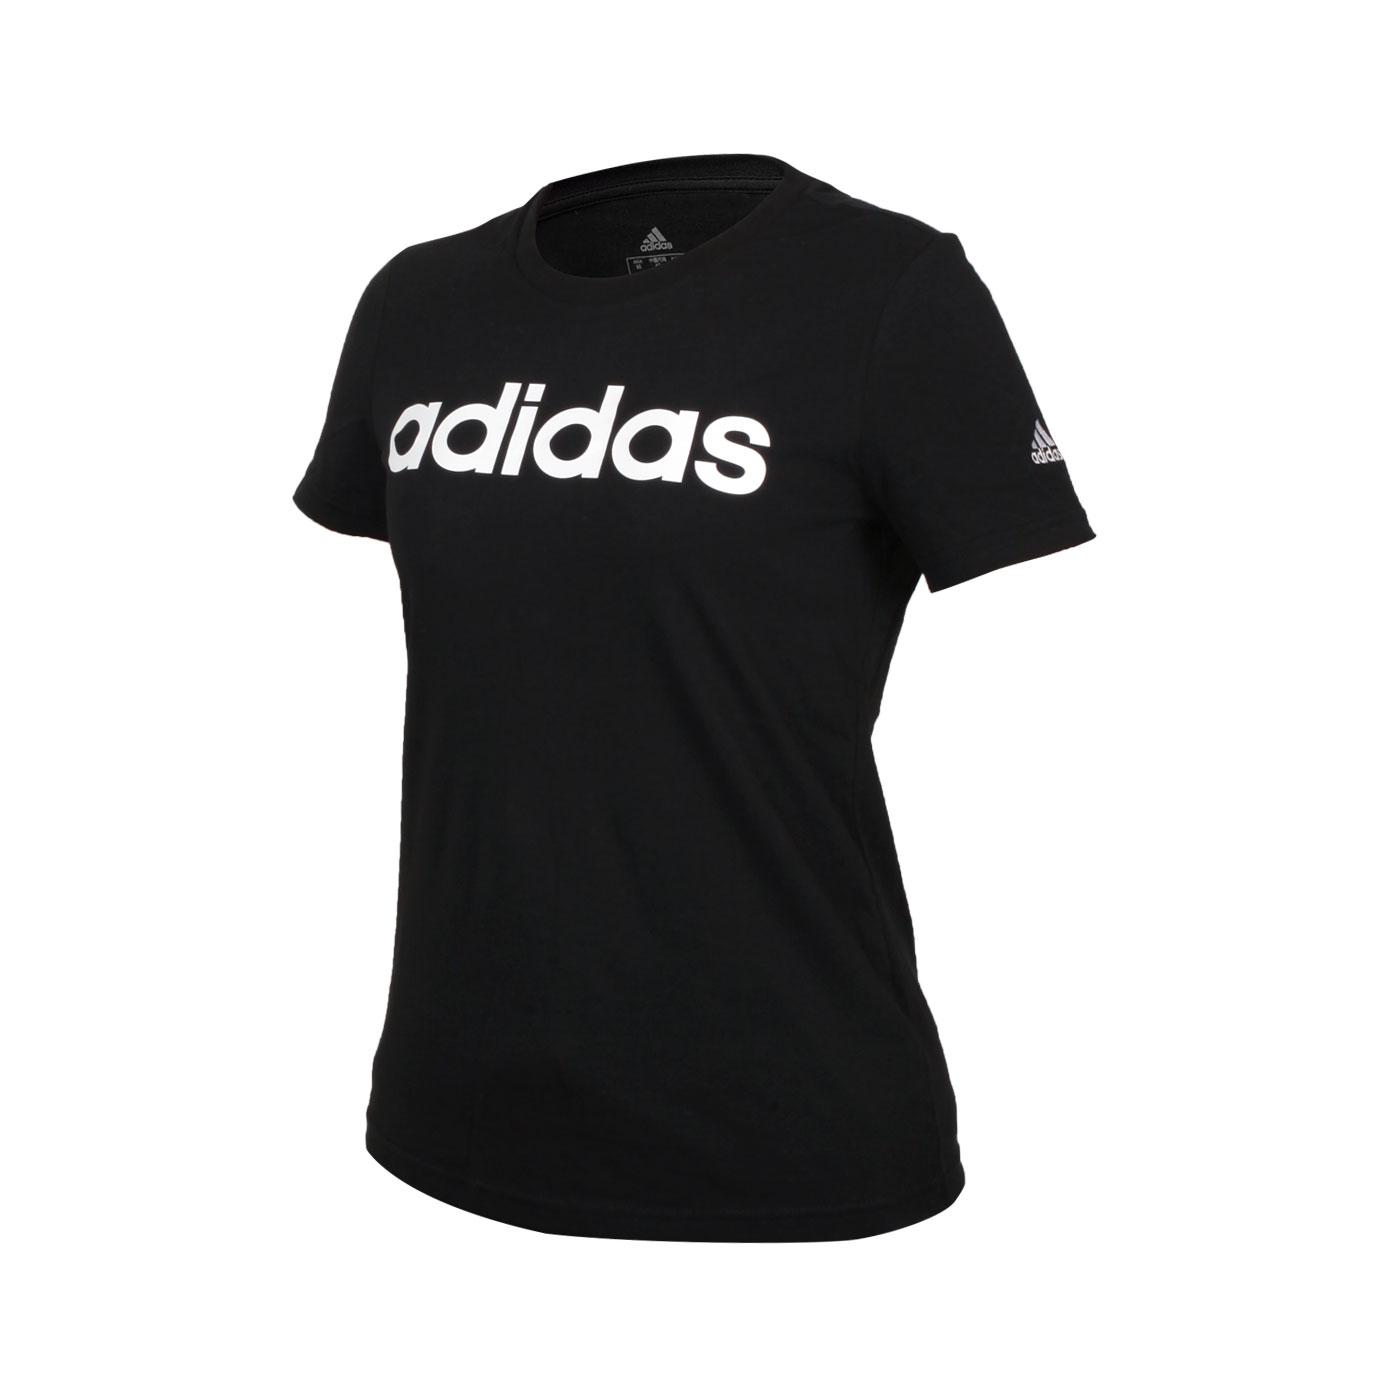 ADIDAS 女款短袖T恤 GL0769